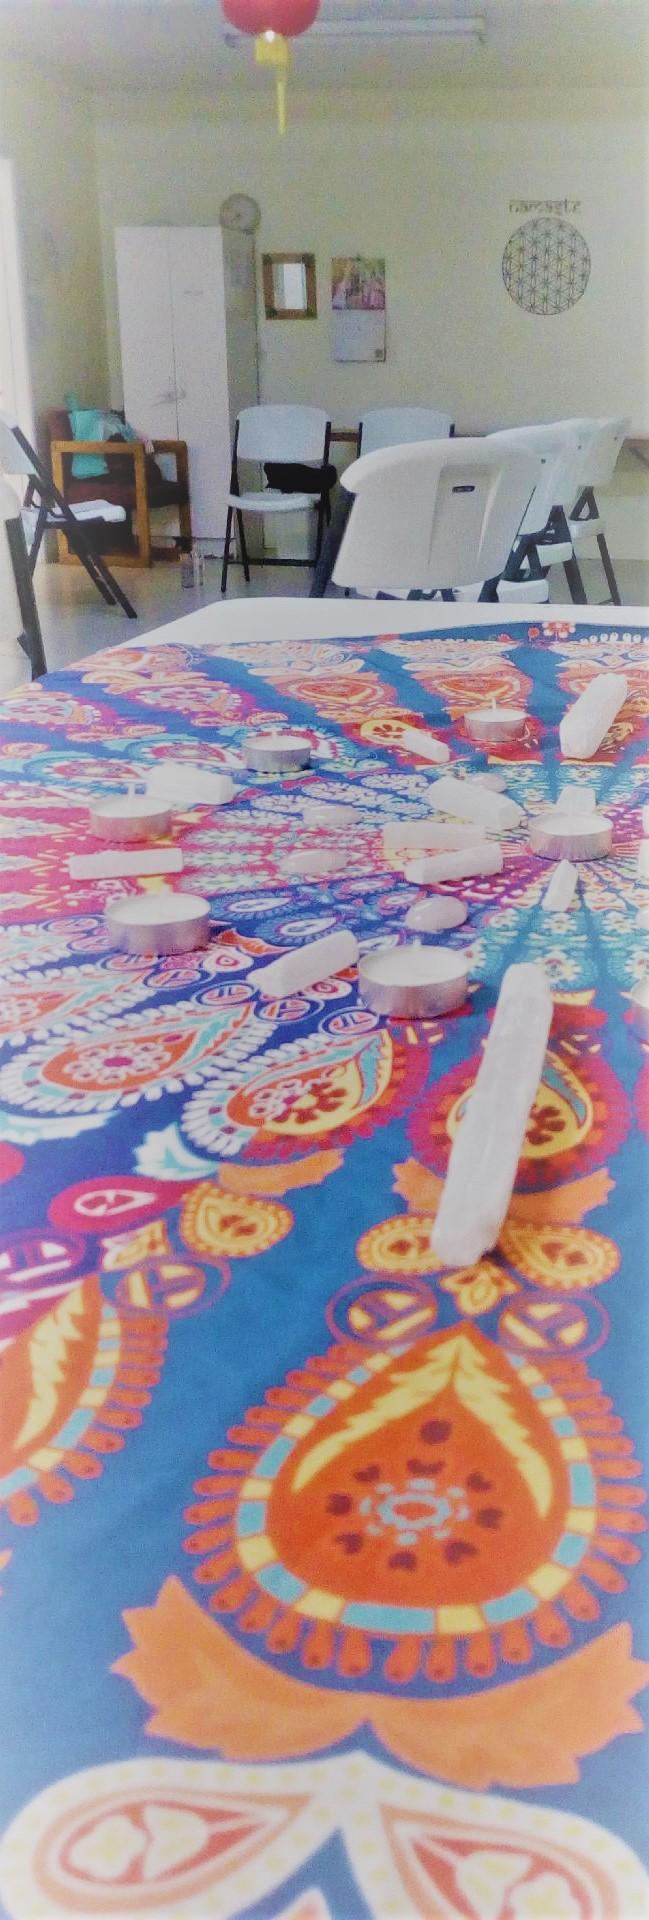 learning-light-foundation-anaheim-oc-shamanic-reiki-circle-crystal-grid-002